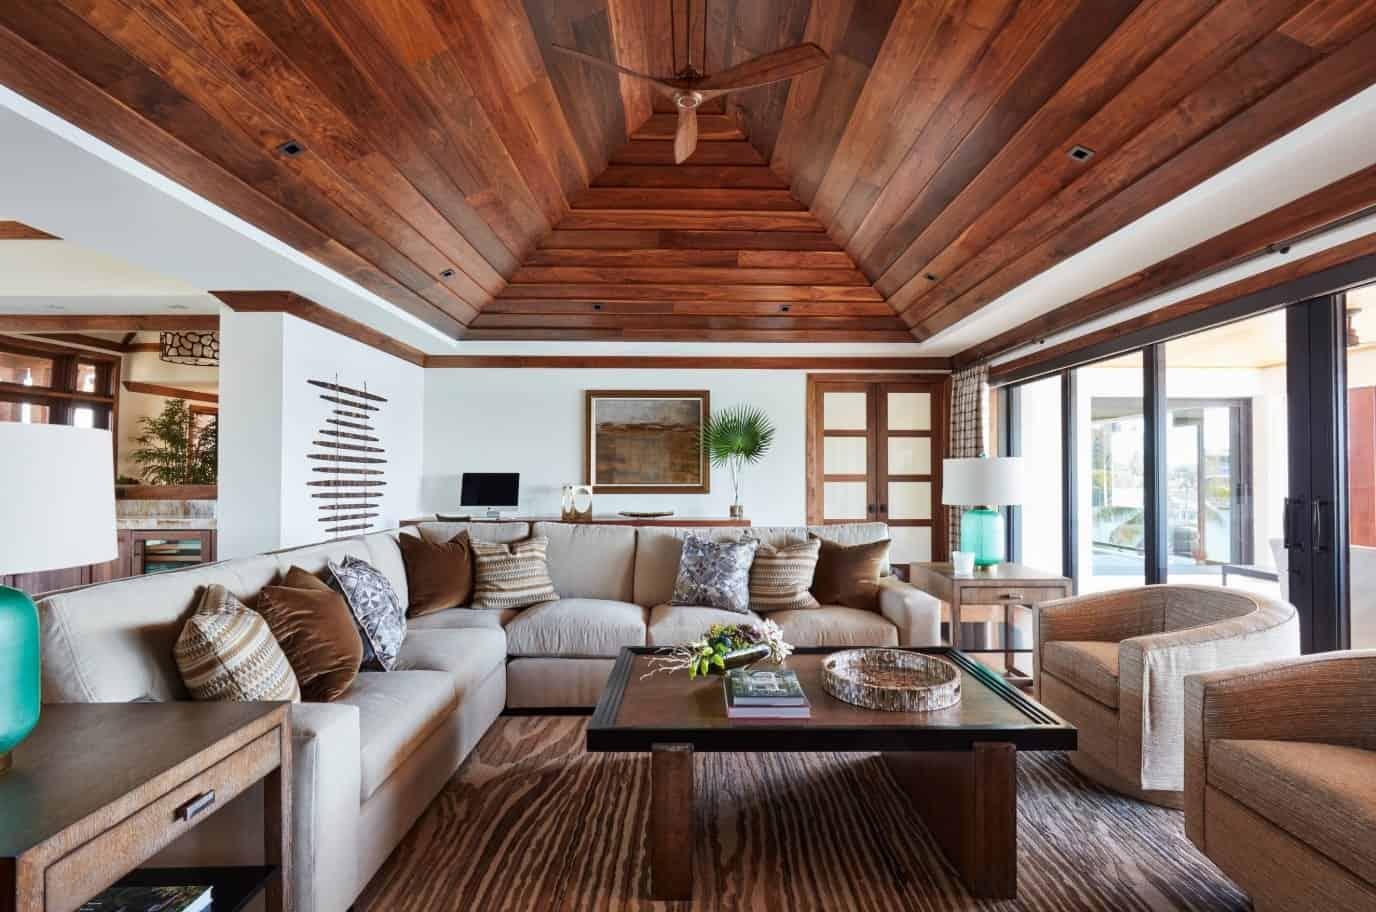 terrific tropical living room | 95 Tropical Living Room Ideas for 2019